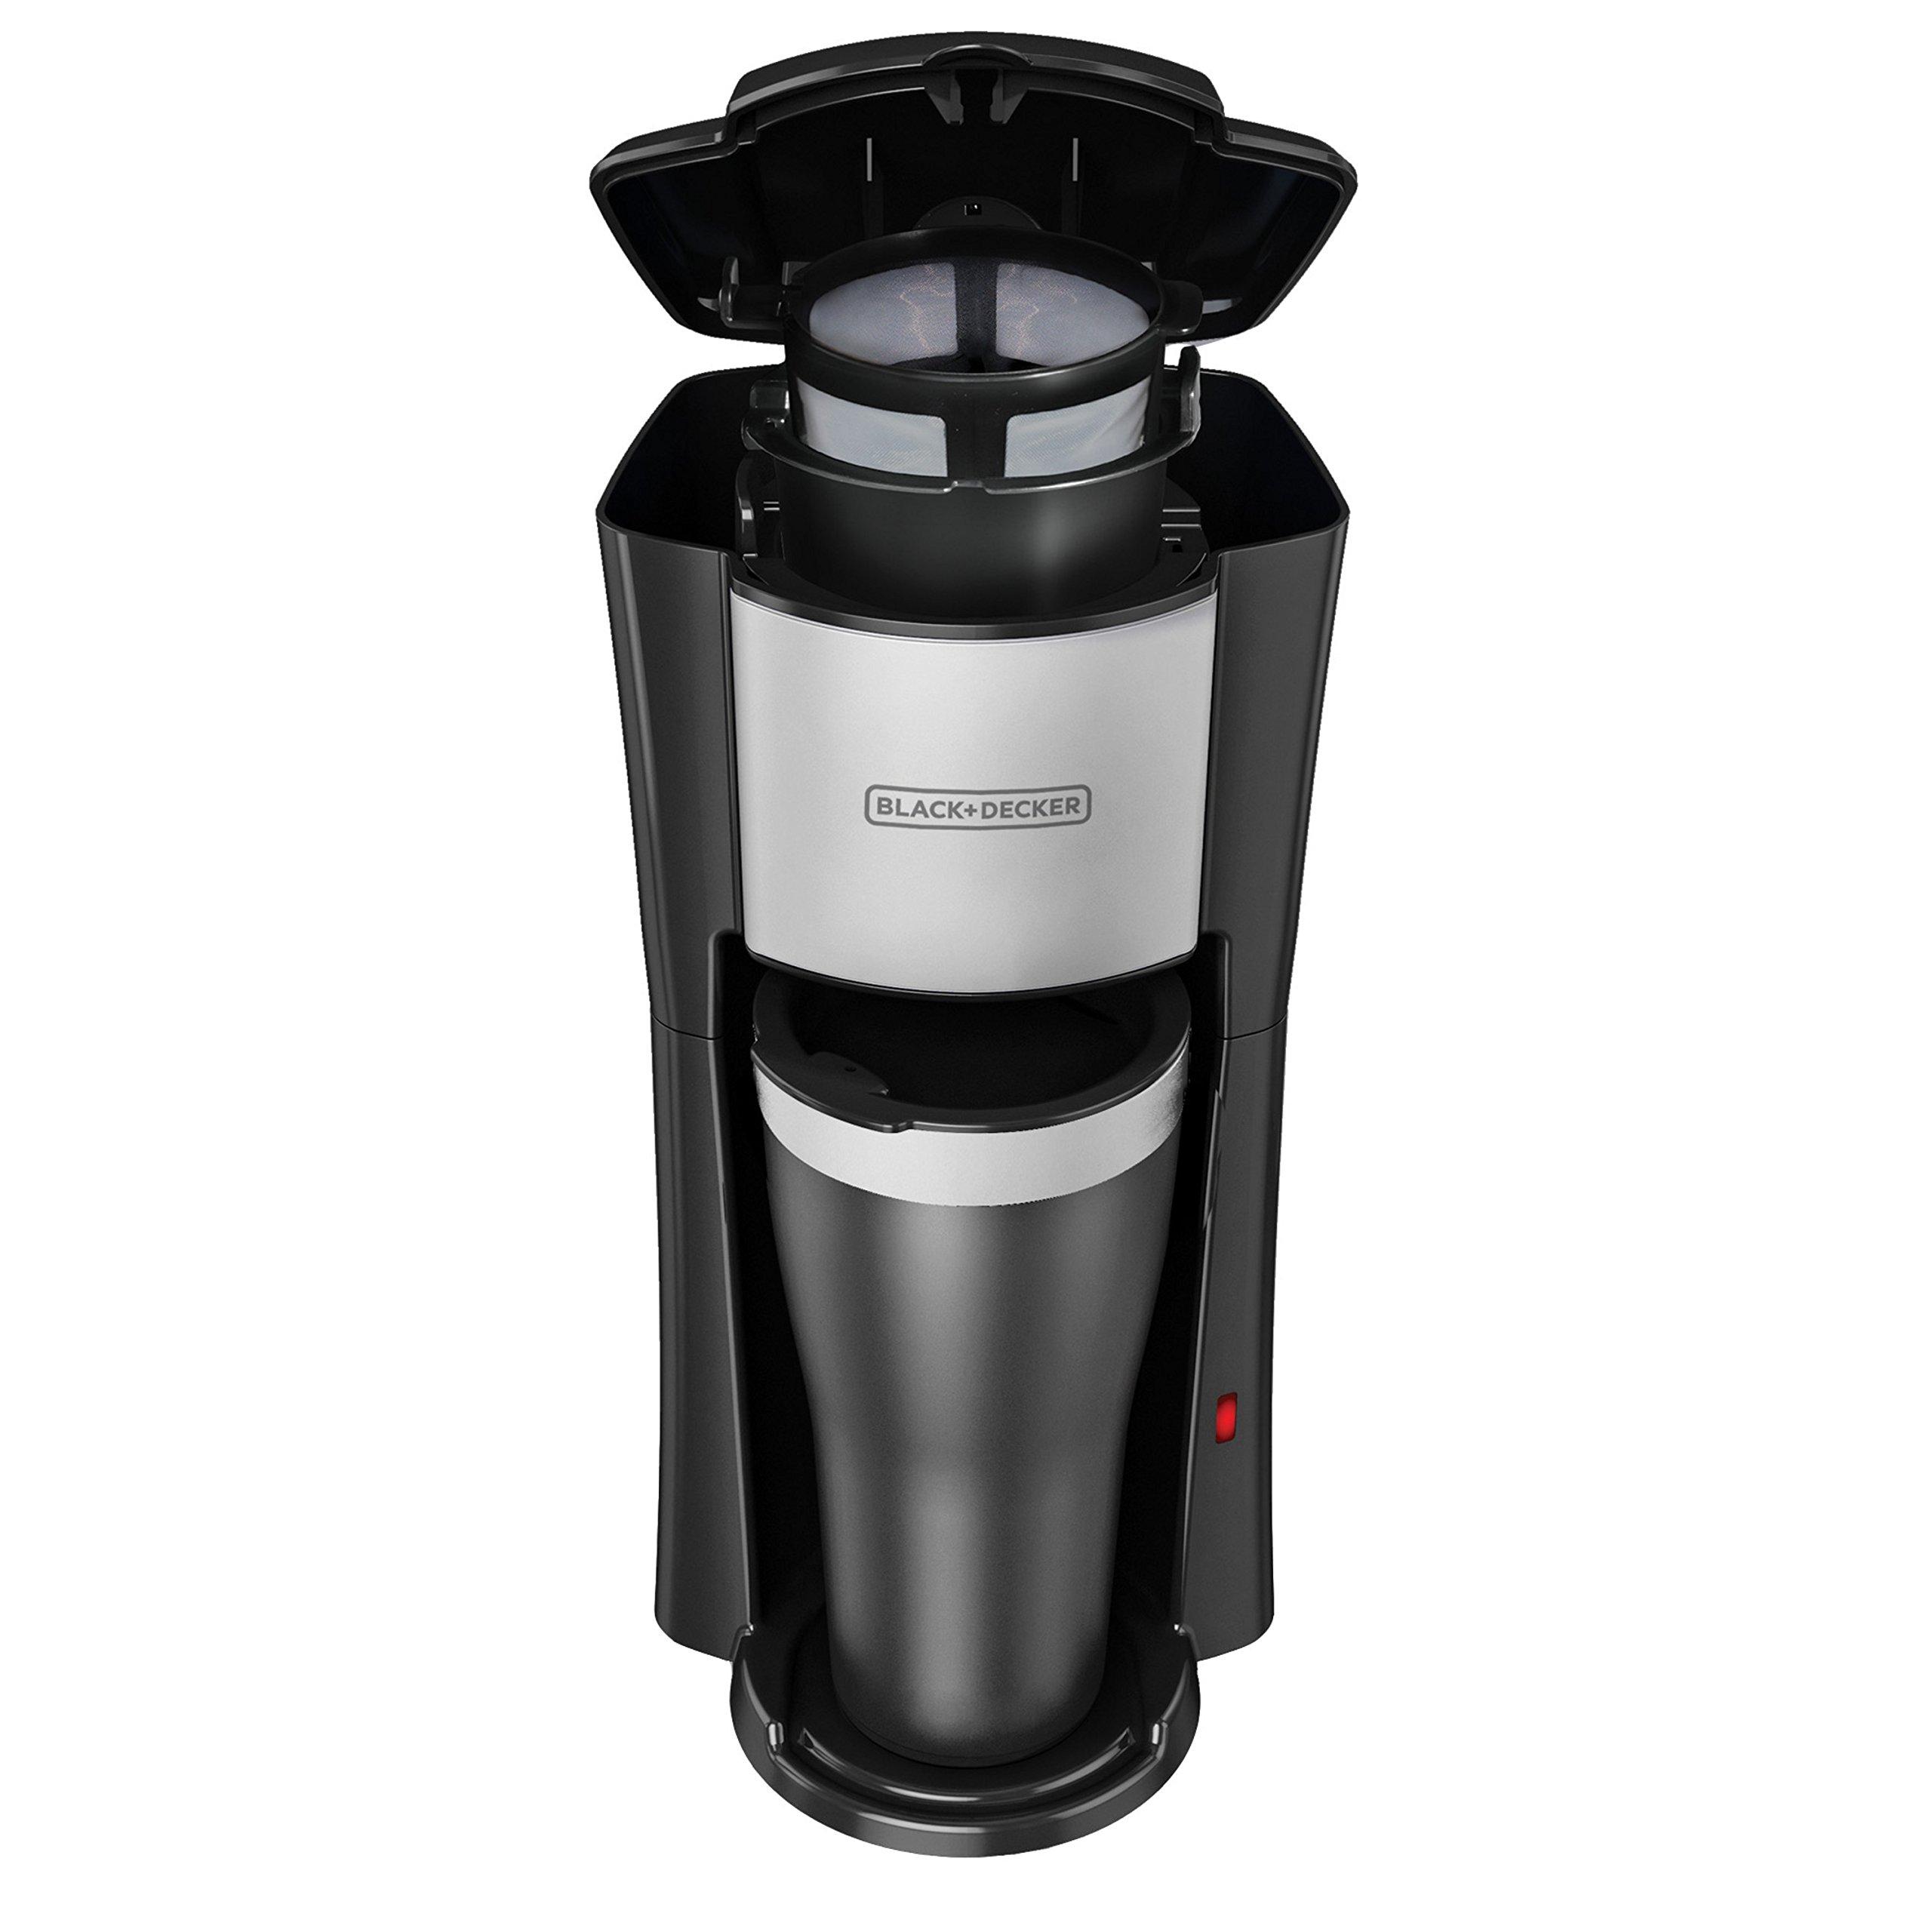 BLACK+DECKER Single Serve Coffeemaker, Black, CM618 by BLACK+DECKER (Image #8)